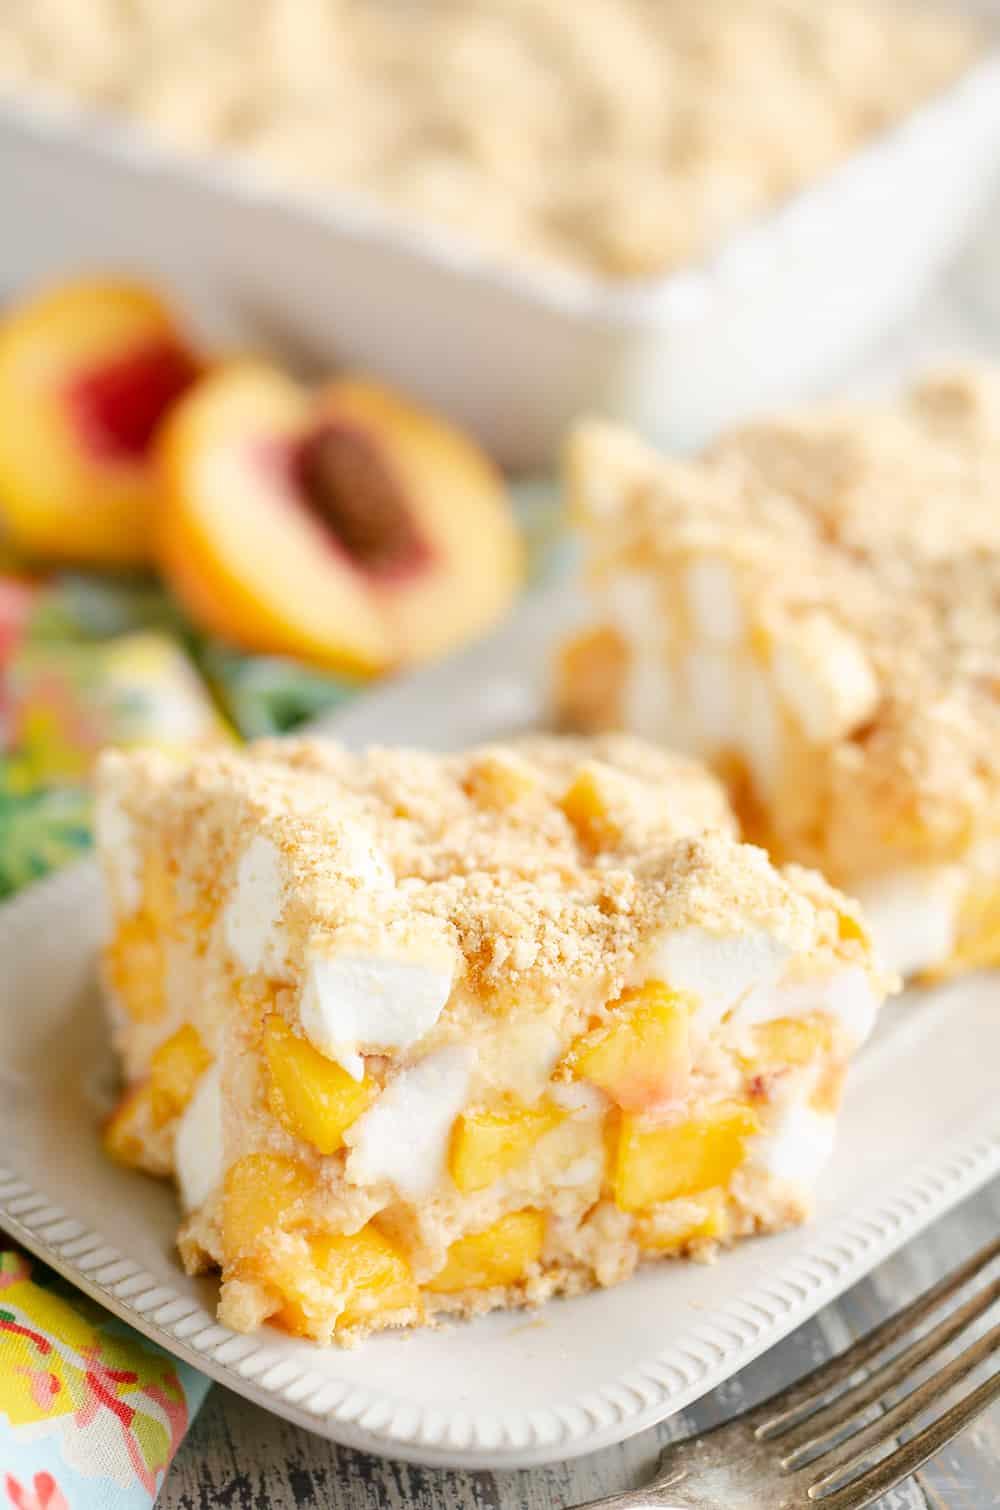 Marshmallow Peach Icebox Dessert piece of dessert